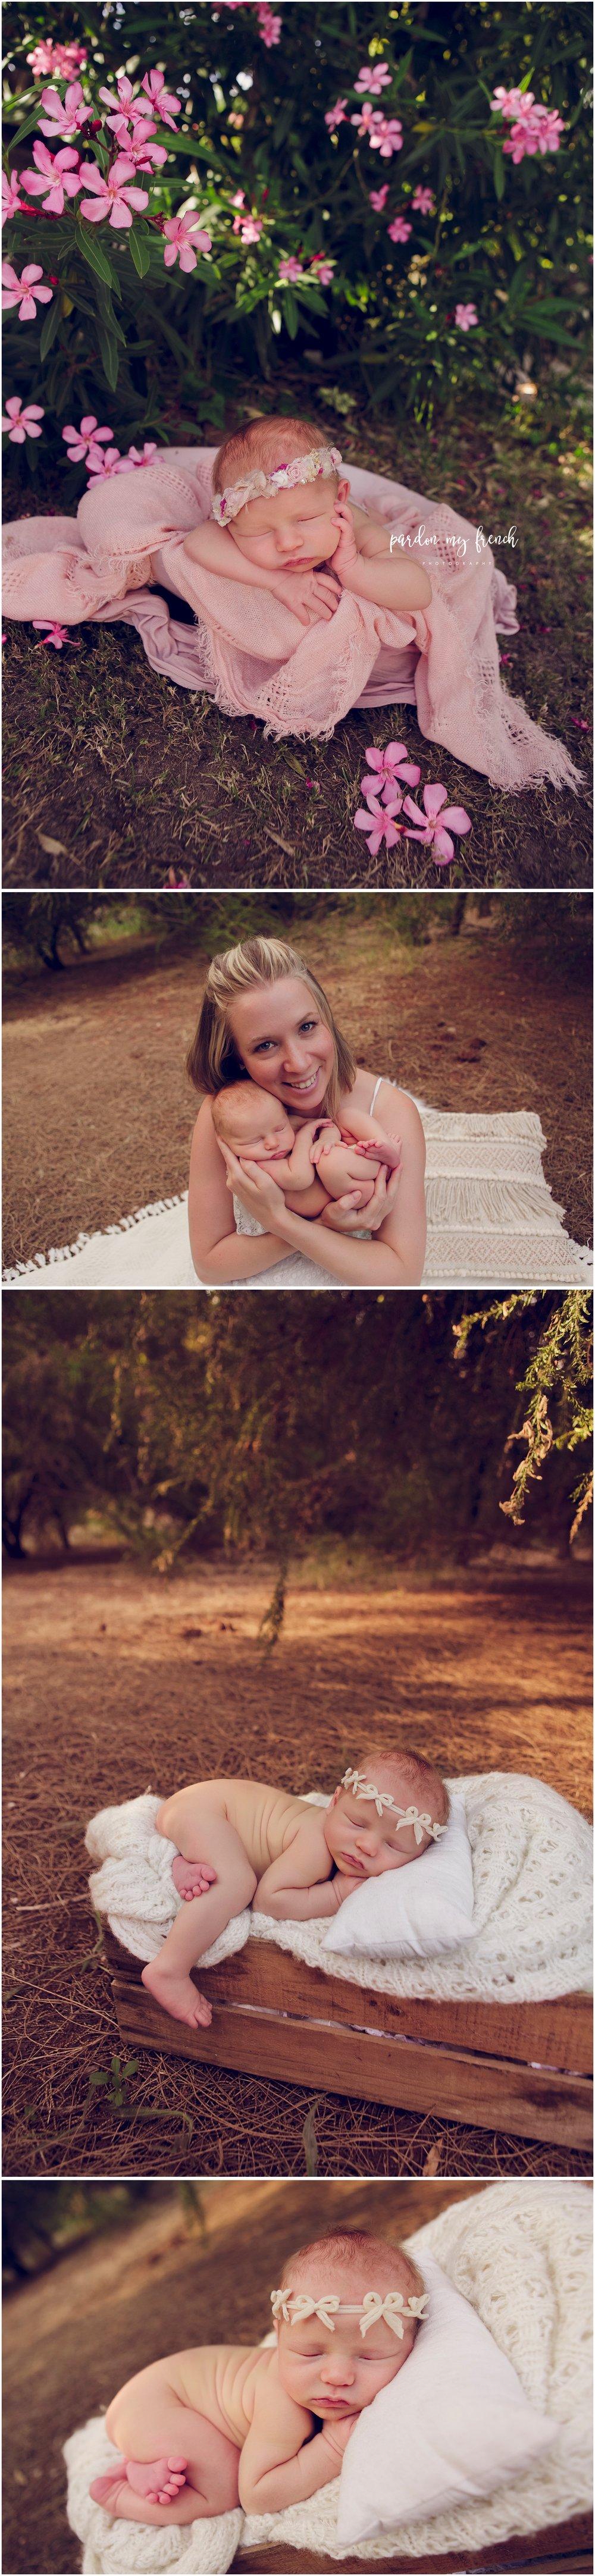 Adelaide newborn Photographer Penny 3.jpg